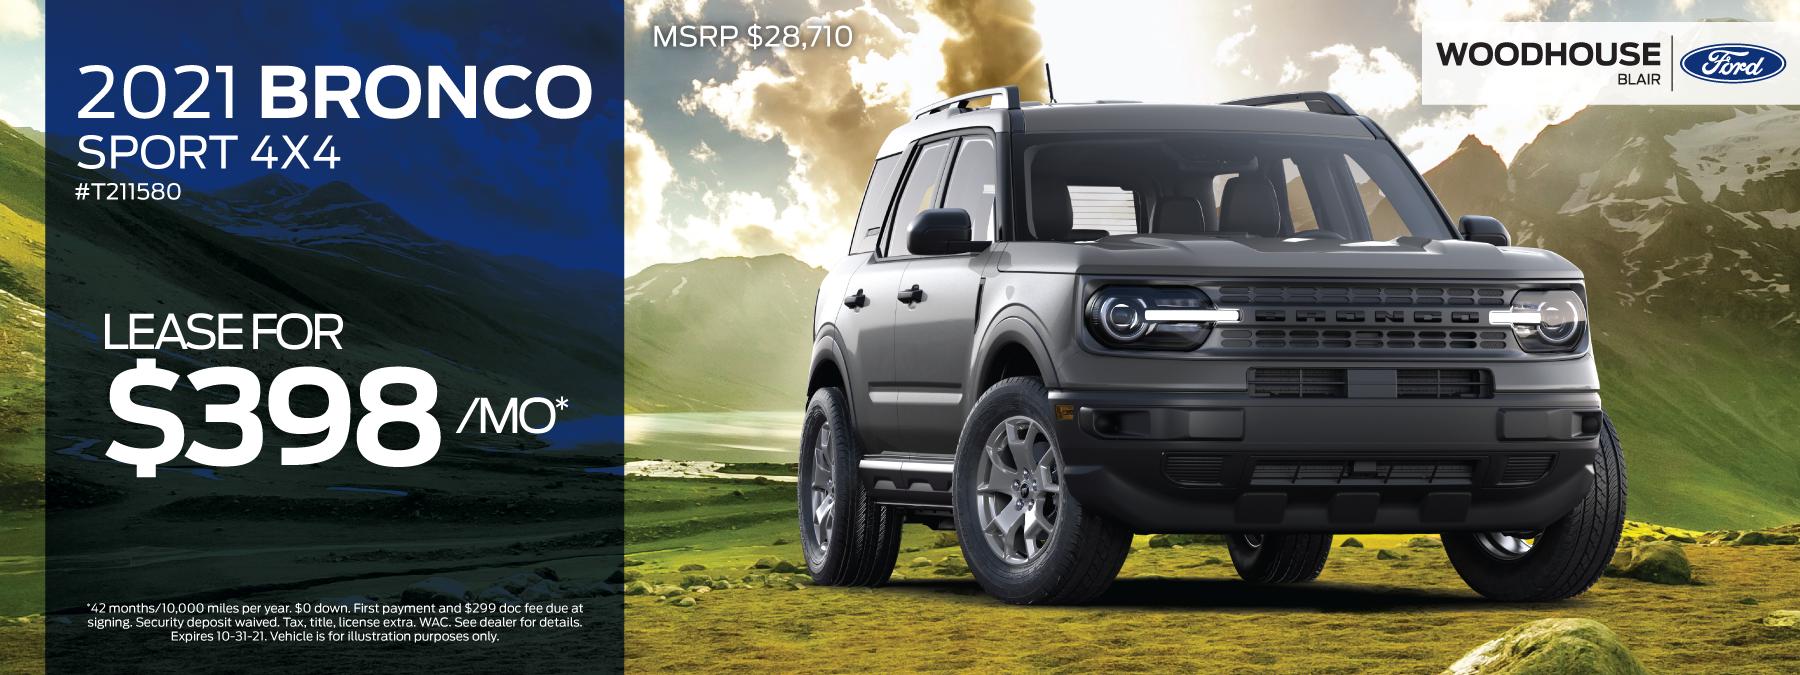 1021-Ford-BLAIR-BRONCO-SPORT-DESKTOP